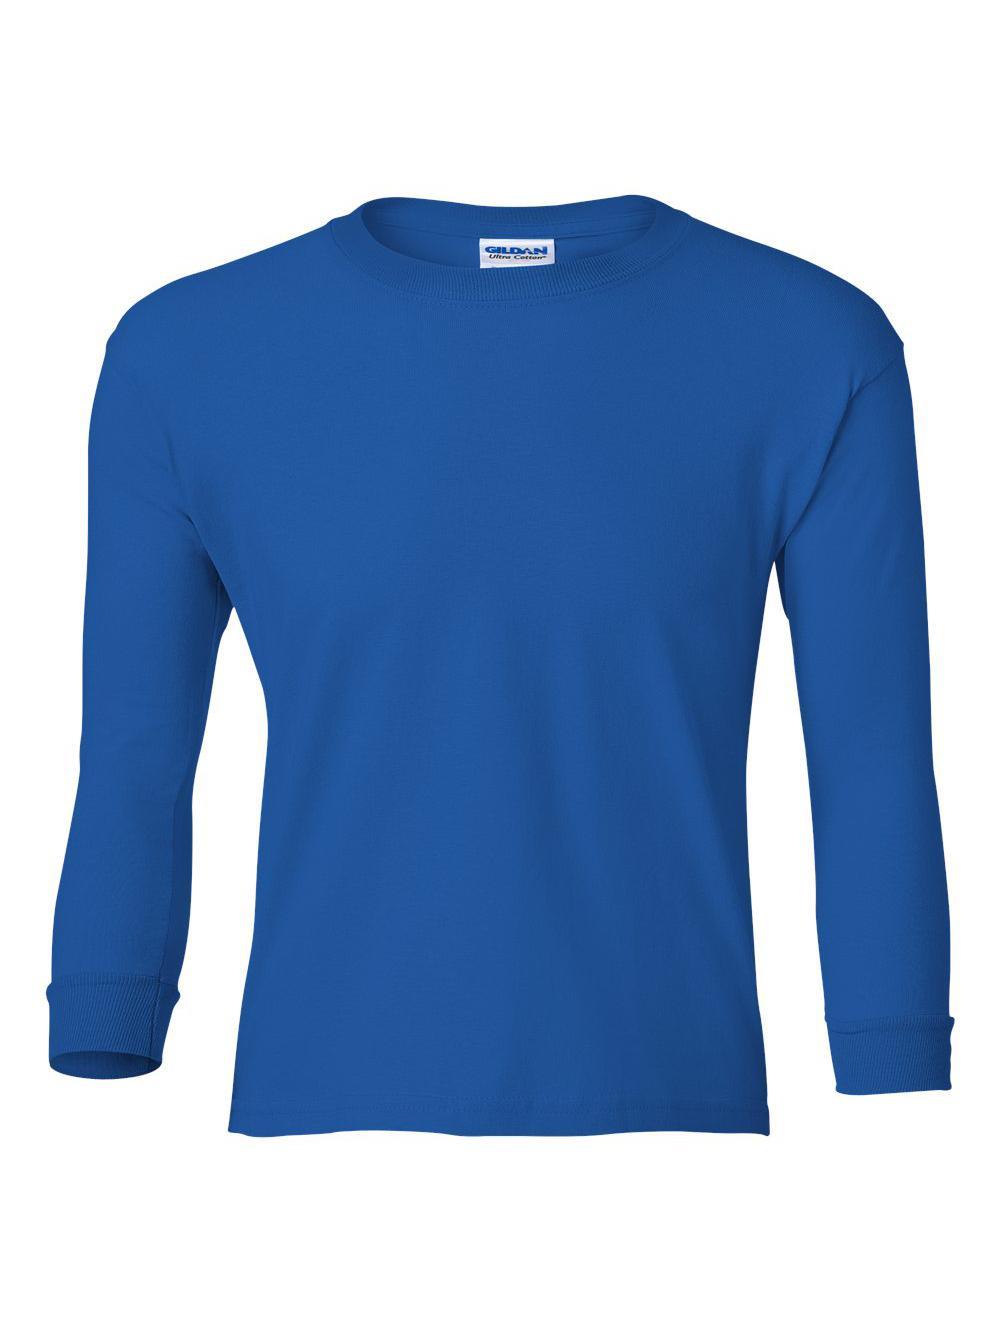 Gildan-Ultra-Cotton-Youth-Long-Sleeve-T-Shirt-2400B thumbnail 36